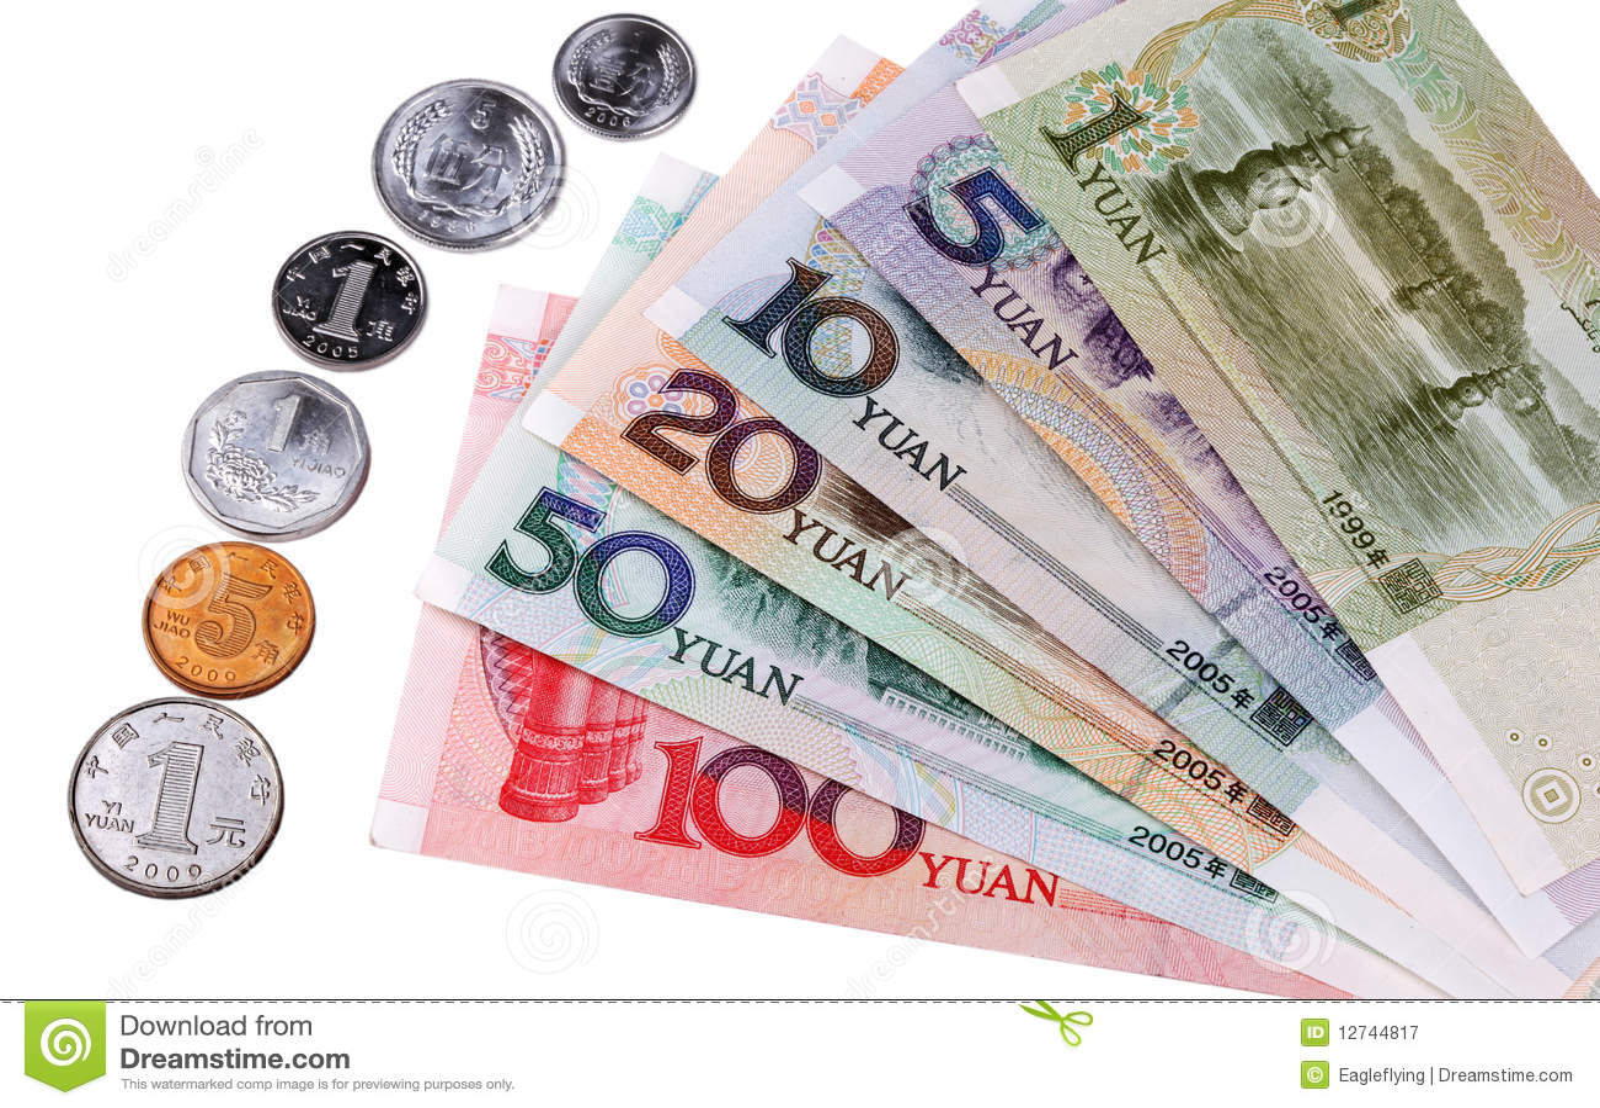 Moeda chinesa: Tipos de notas de banco e de moedas